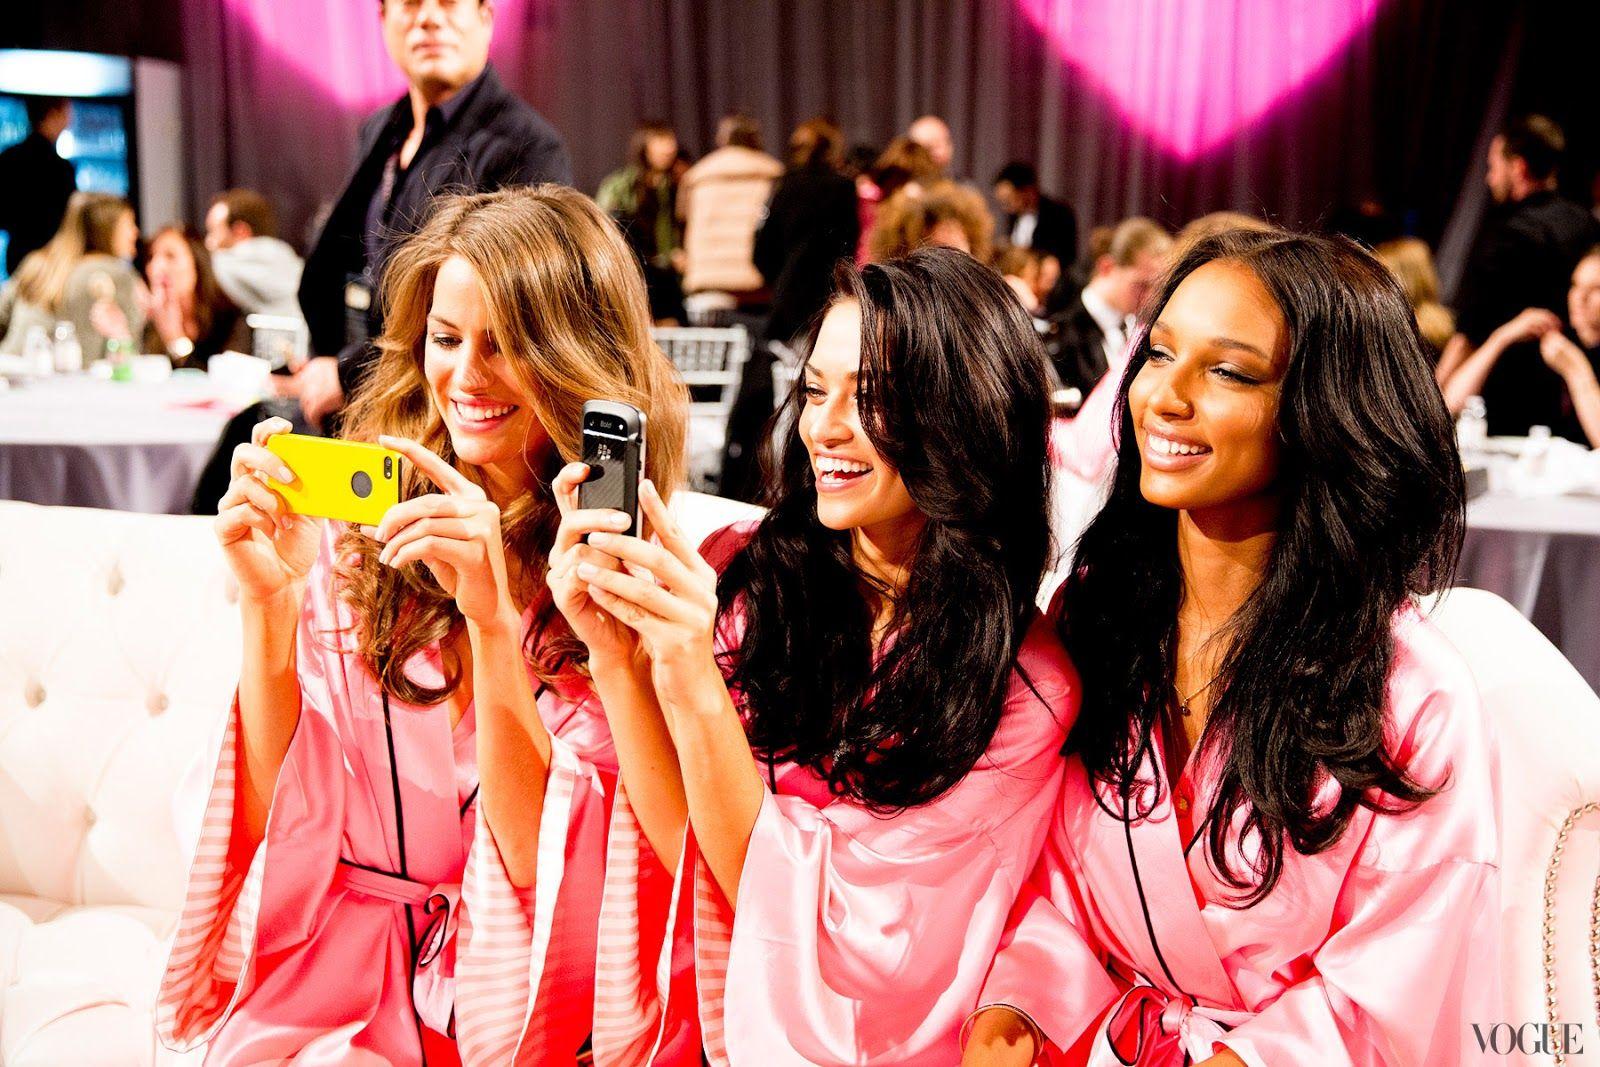 Victoria S Secret Fun Night